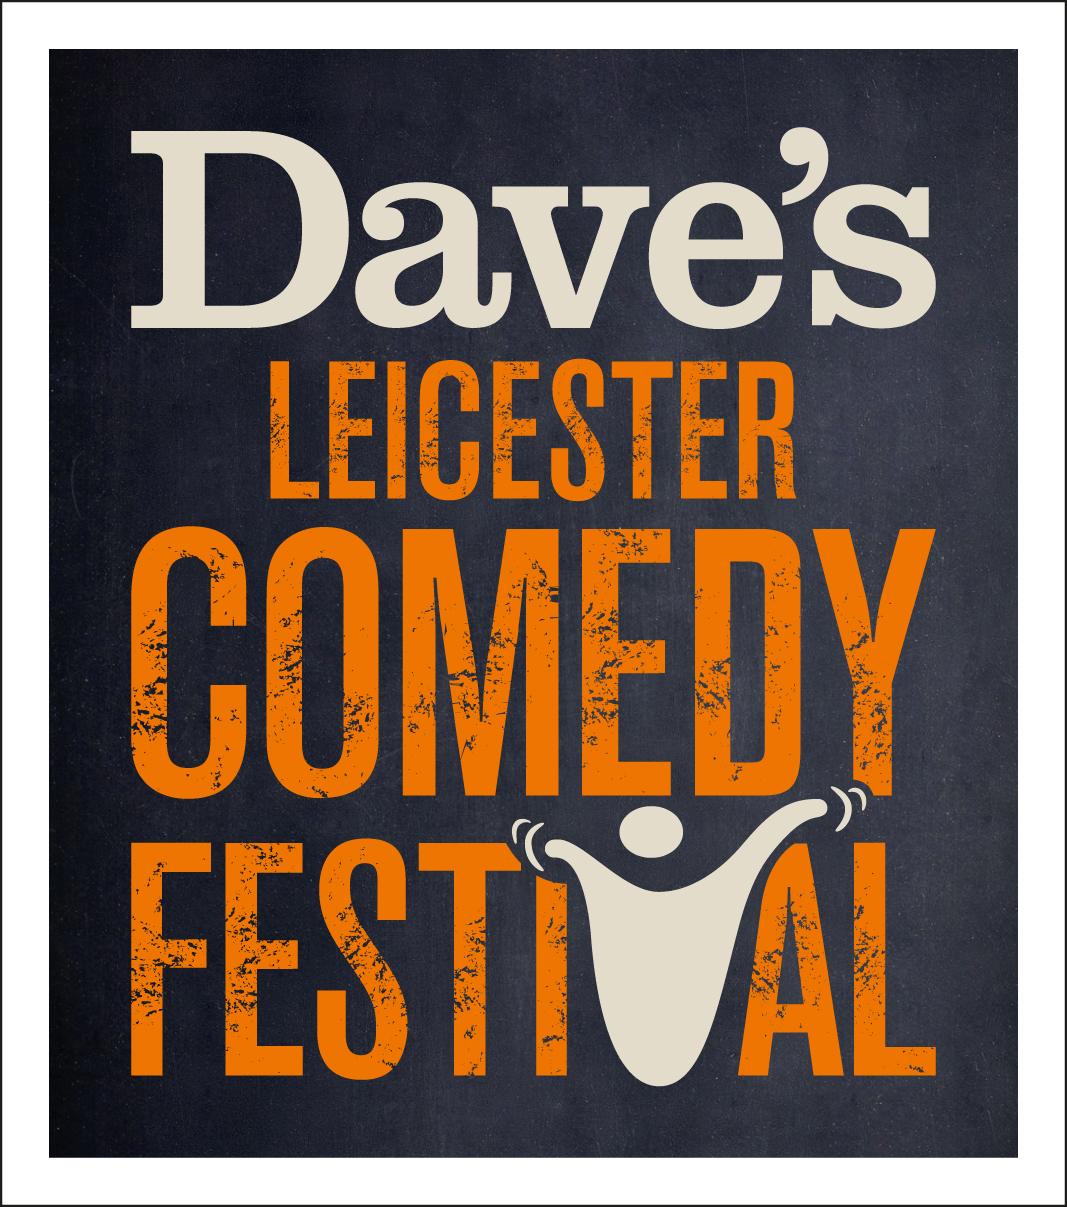 dave's leicester comedy festival